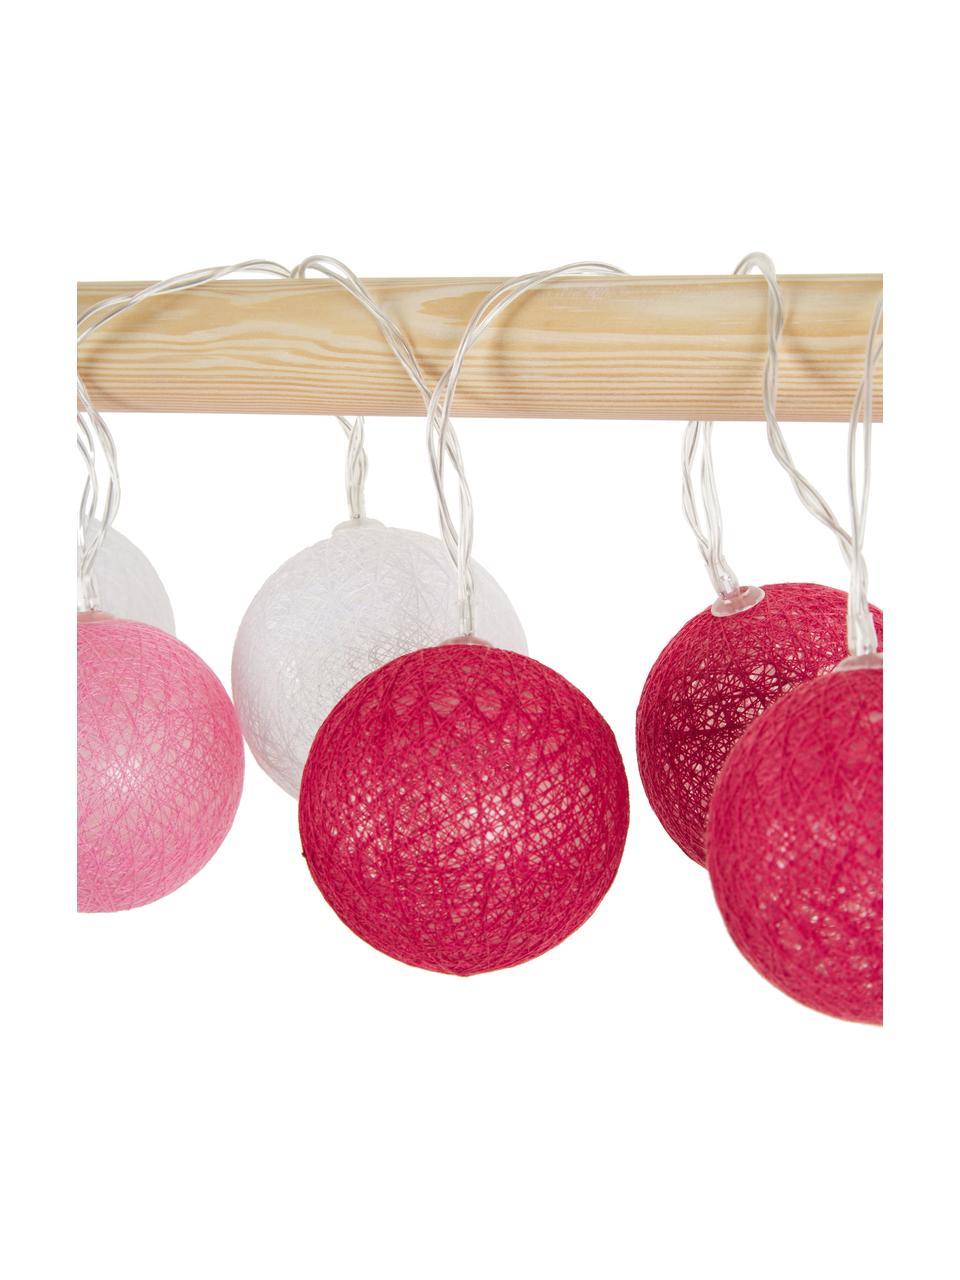 LED-Lichterkette Bellin, 320 cm, 20 Lampions, Lampions: Baumwolle, Pink, Dunkelrot, Weiß, L 320 cm